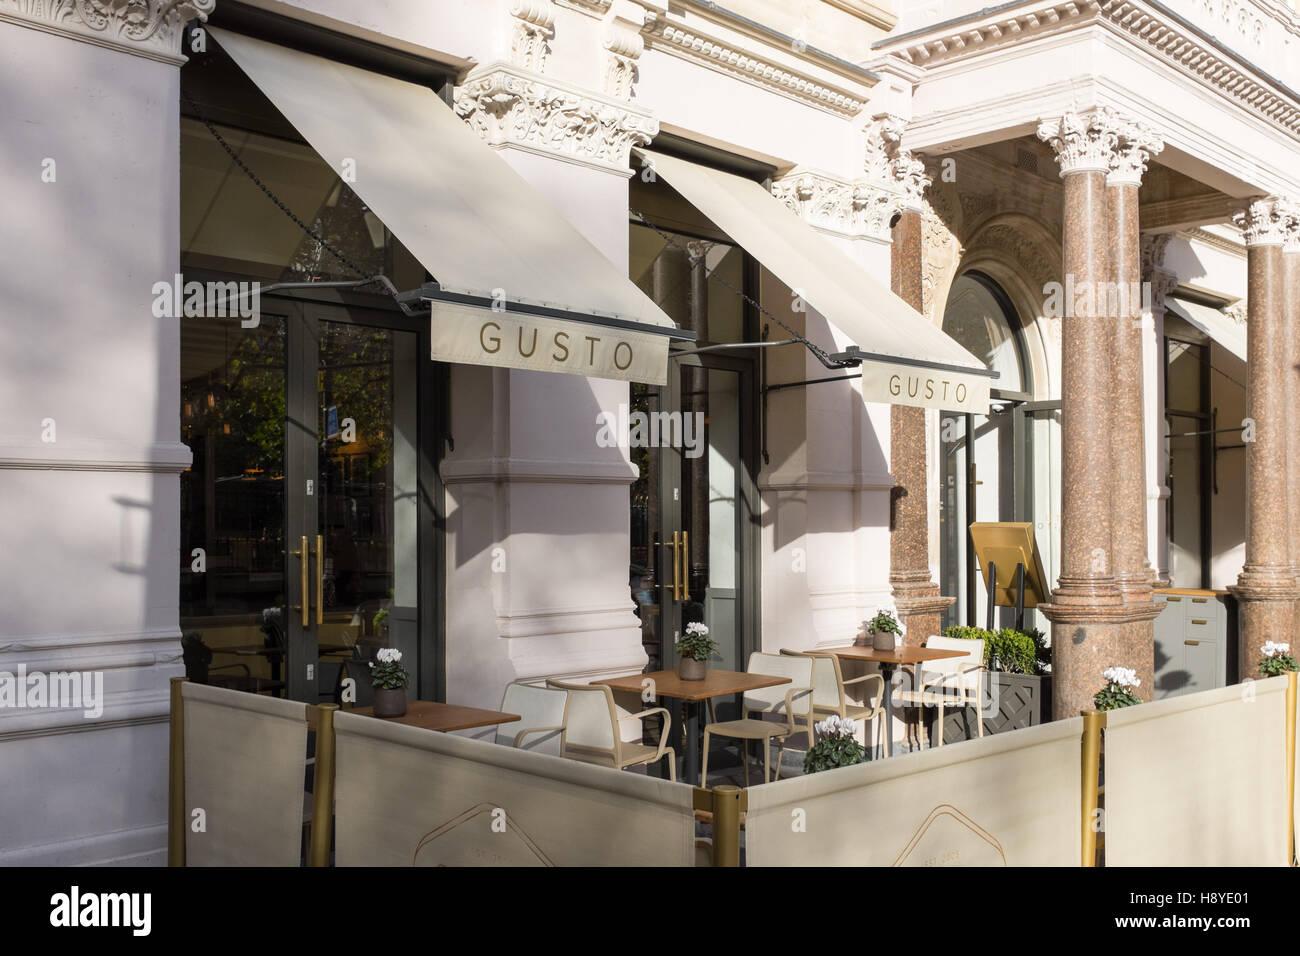 Gusto italian restaurant in Colmore Row, Birmingham - Stock Image